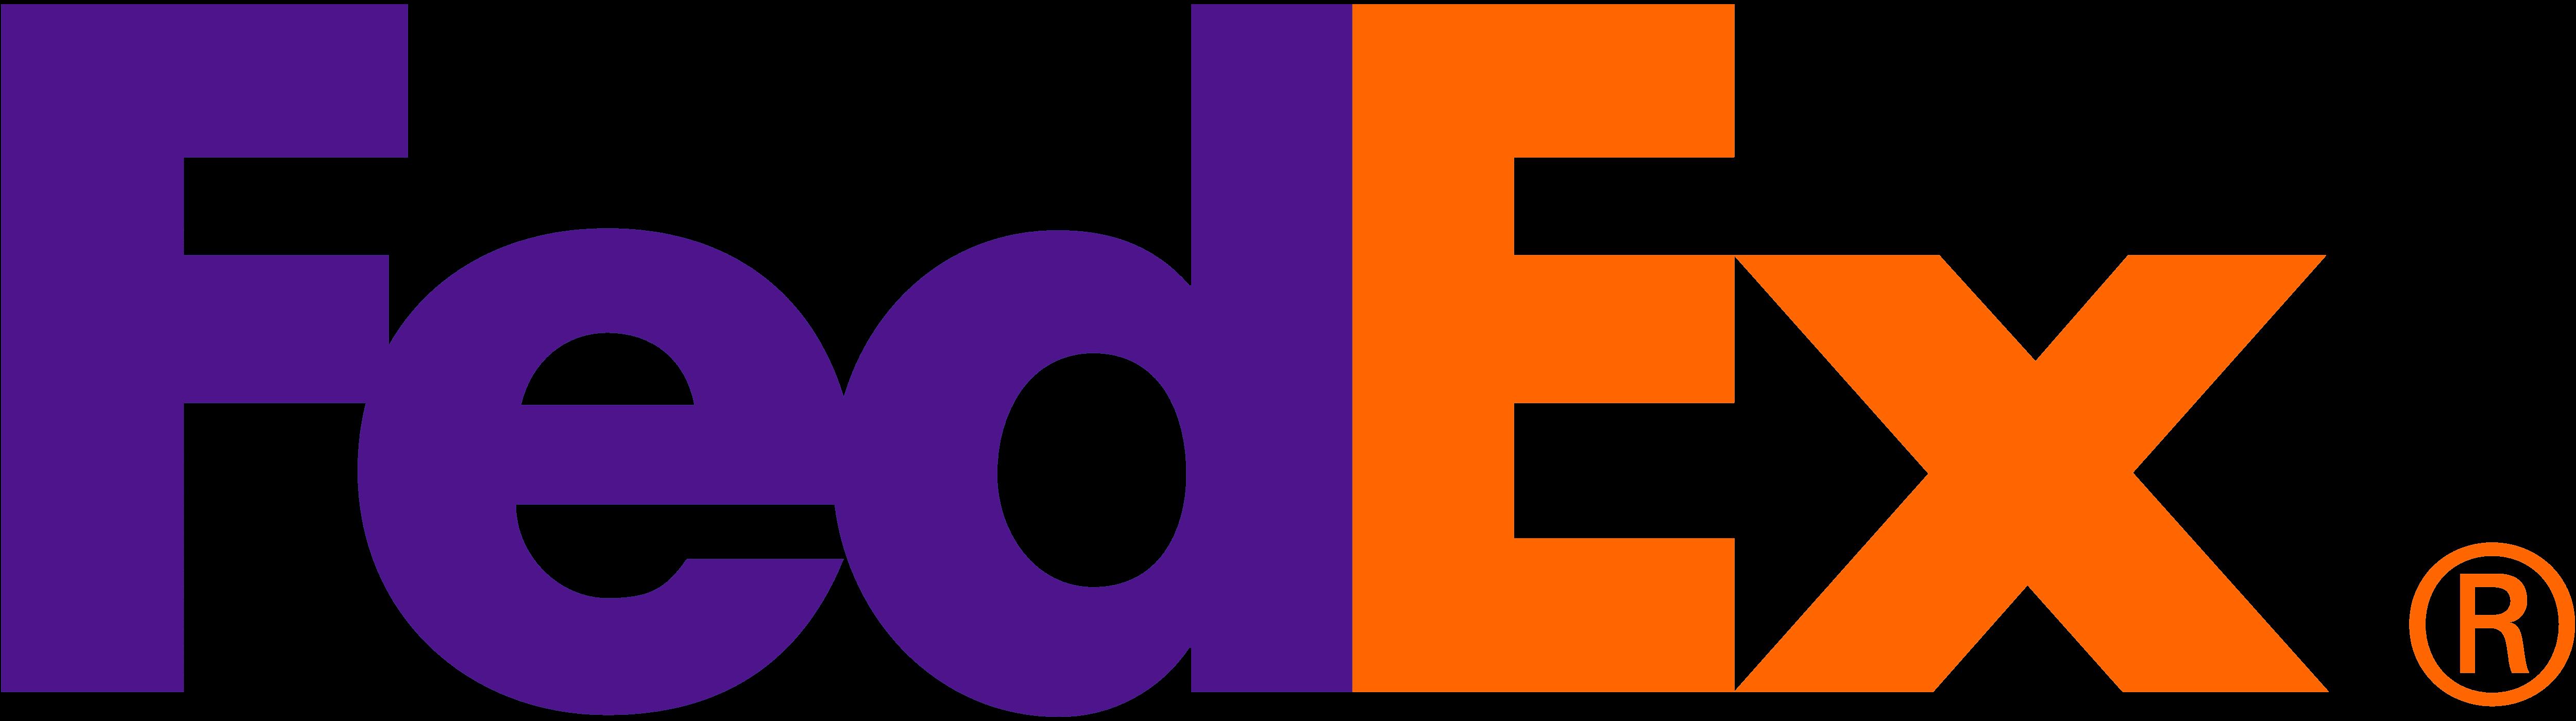 FedEx logo orange purple